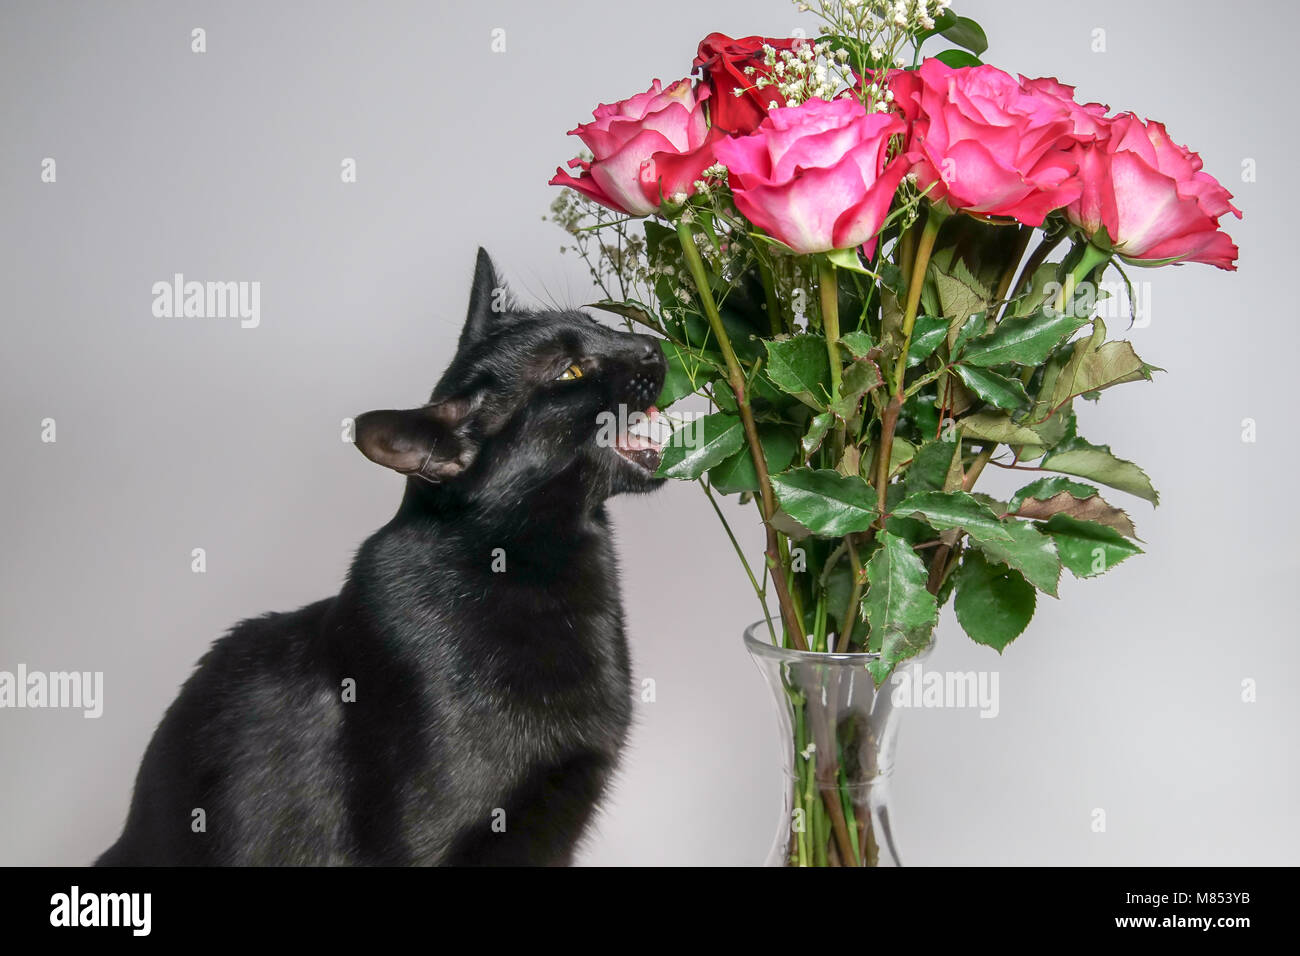 Mothers day cat flowers stock photo 177133807 alamy mothers day cat flowers mightylinksfo